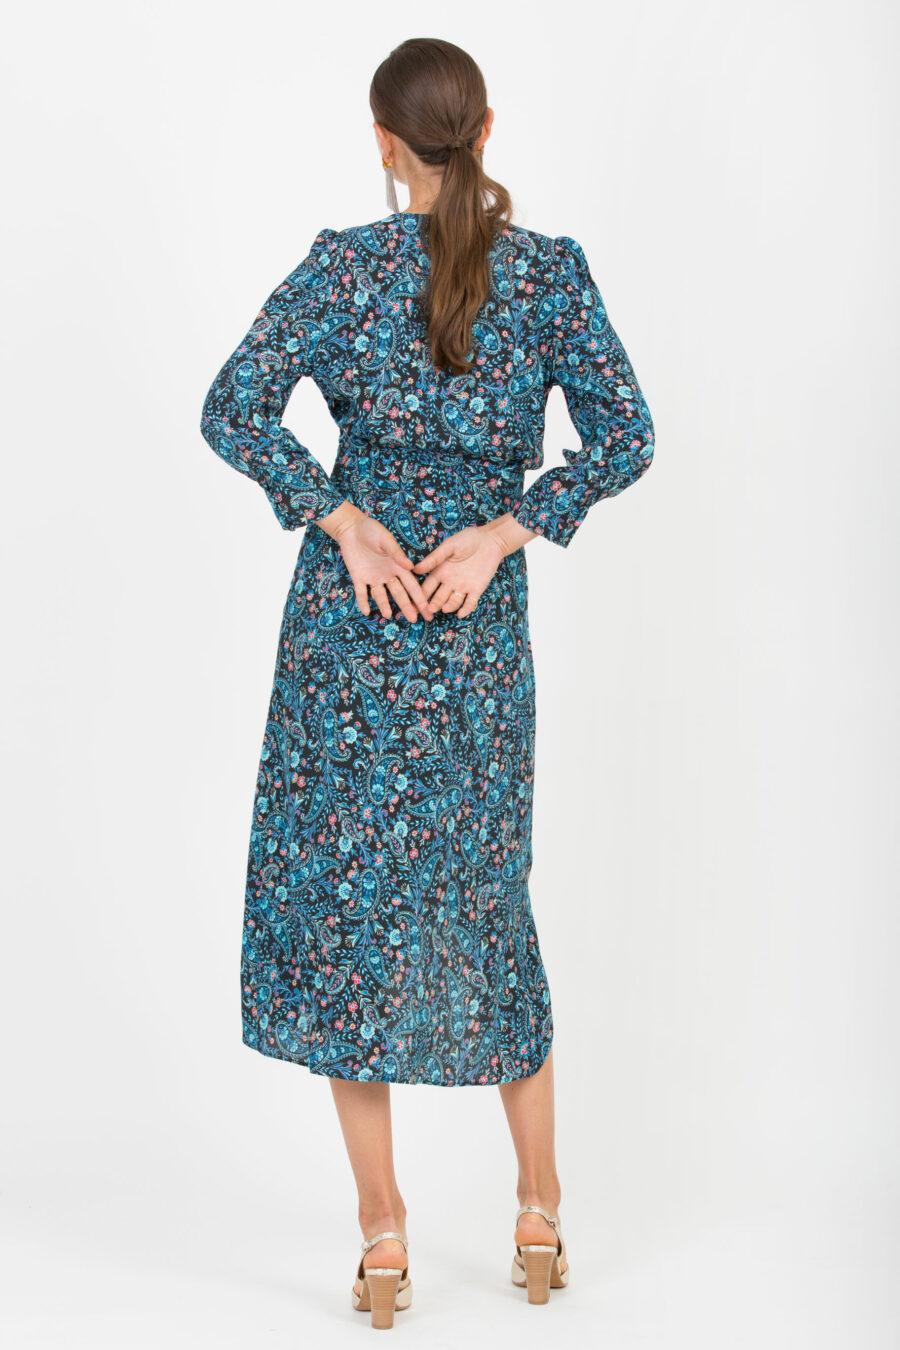 Valentina Blue Dress